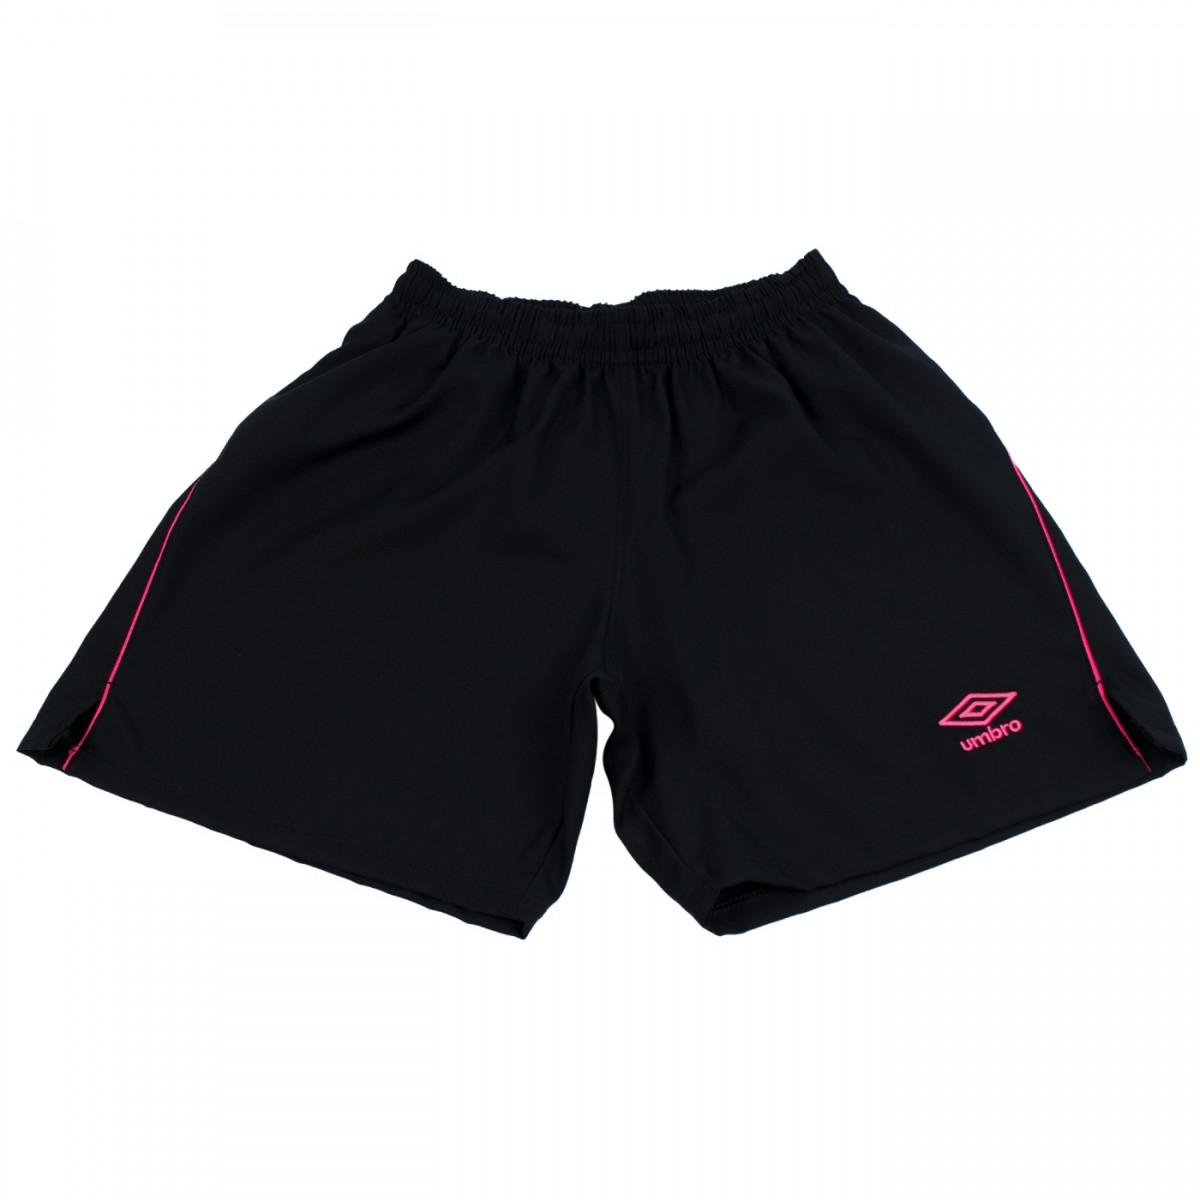 4bd05ba04a Shorts Umbro Twr Princes 2t02021 - Preto